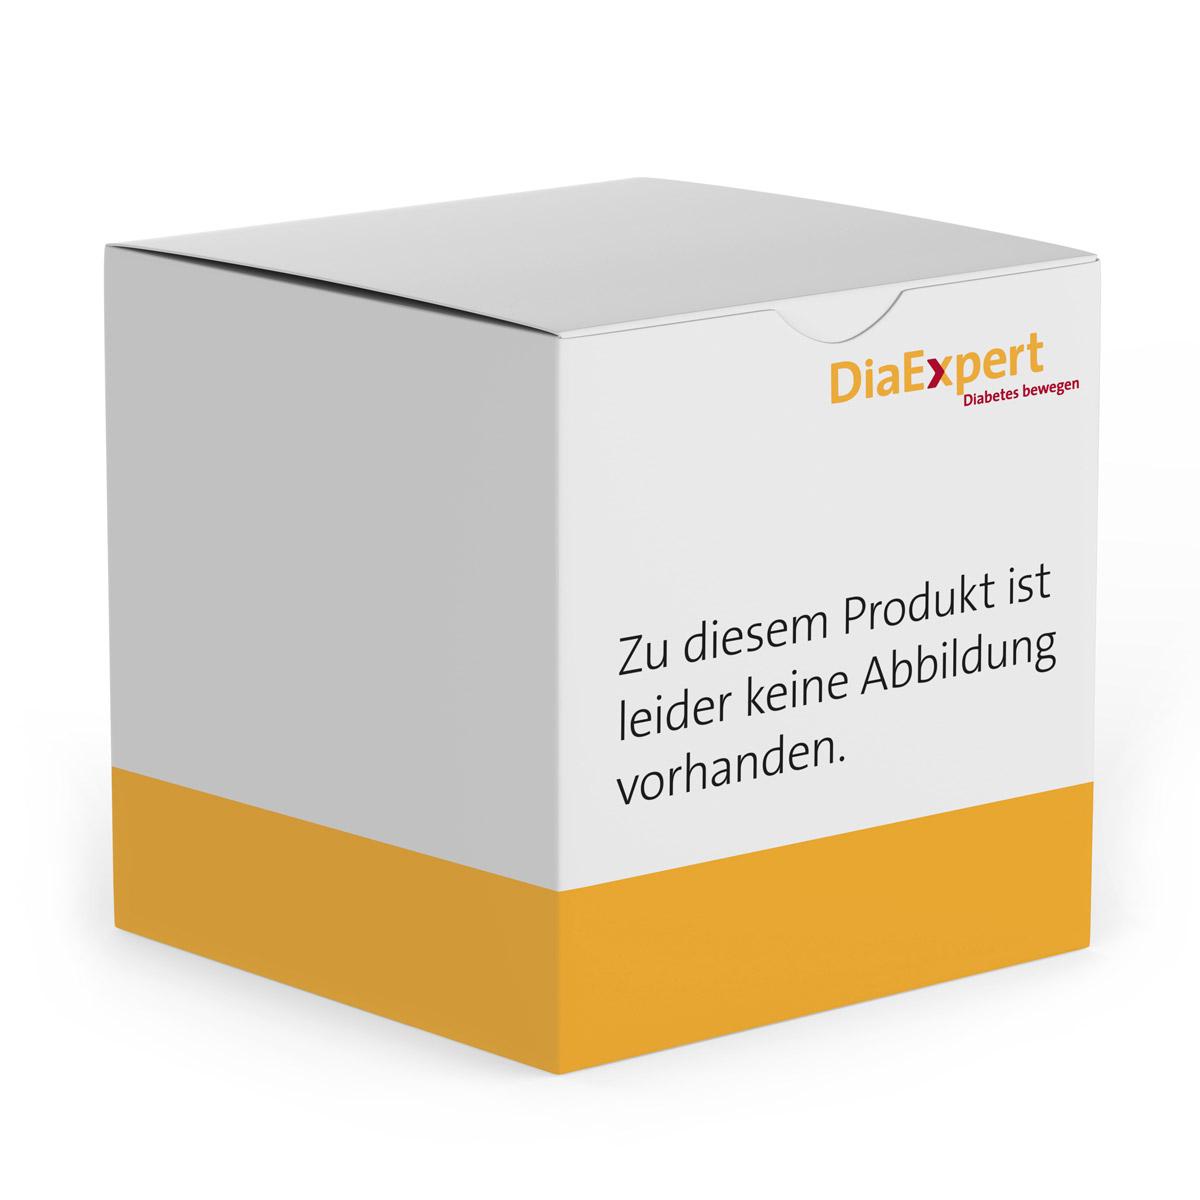 Duschbeutel transparent für alle Medtronic/MiniMed Insulinpumpen